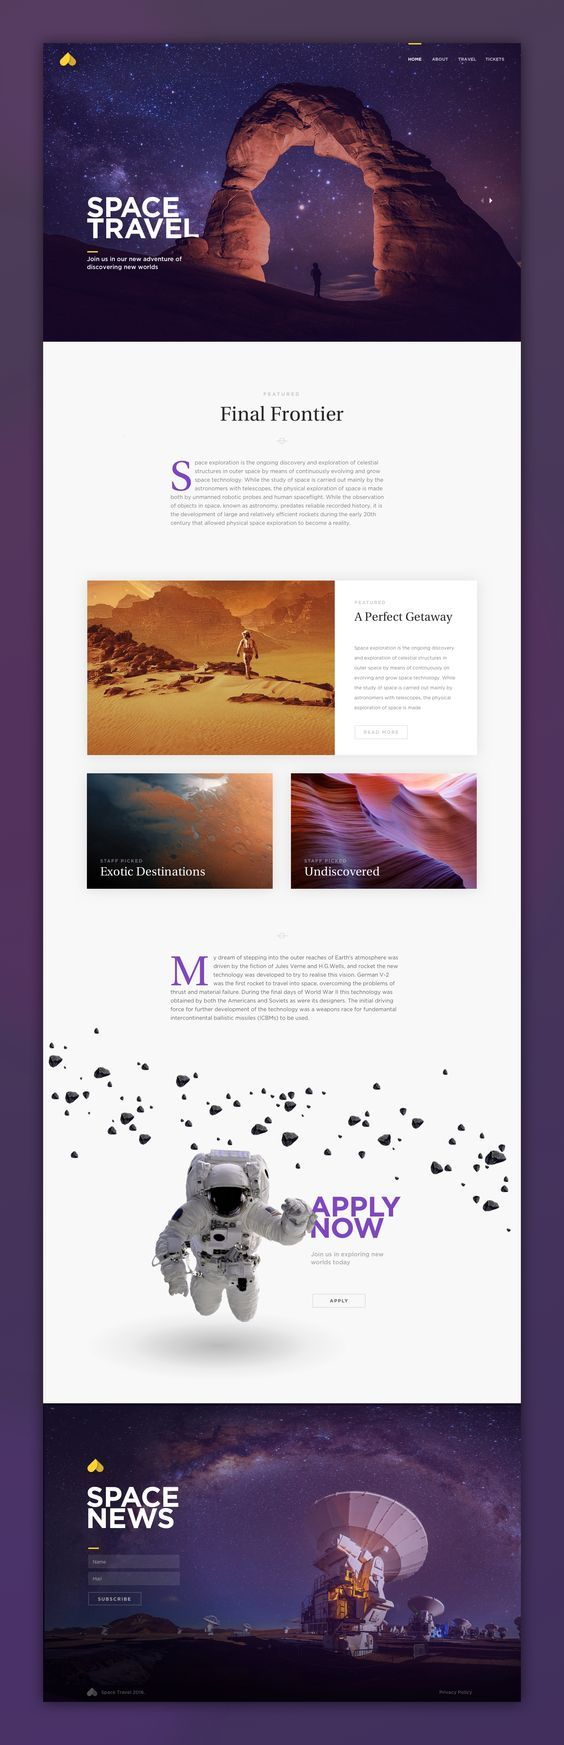 Space Travel Web Design | Fivestar Branding – Design and Branding Agency & Inspiration Gallery